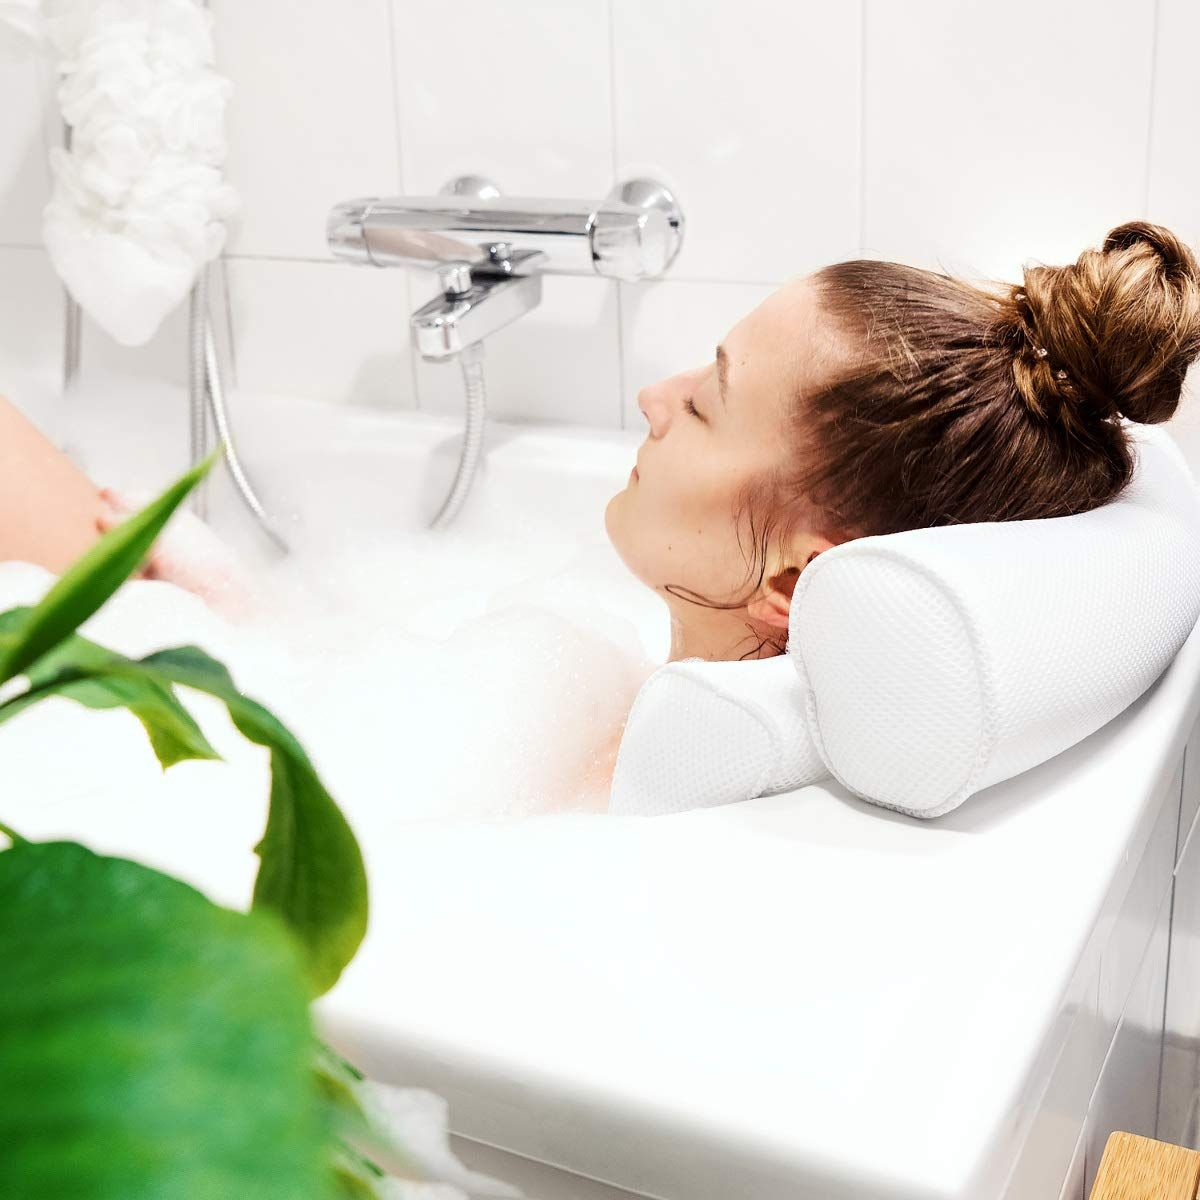 Navaris Badekissen Badezimmer Bad Badewanne Wellness Makeup Beauty Tips Bath Bathroom Badewanne Badewannenkissen Baden